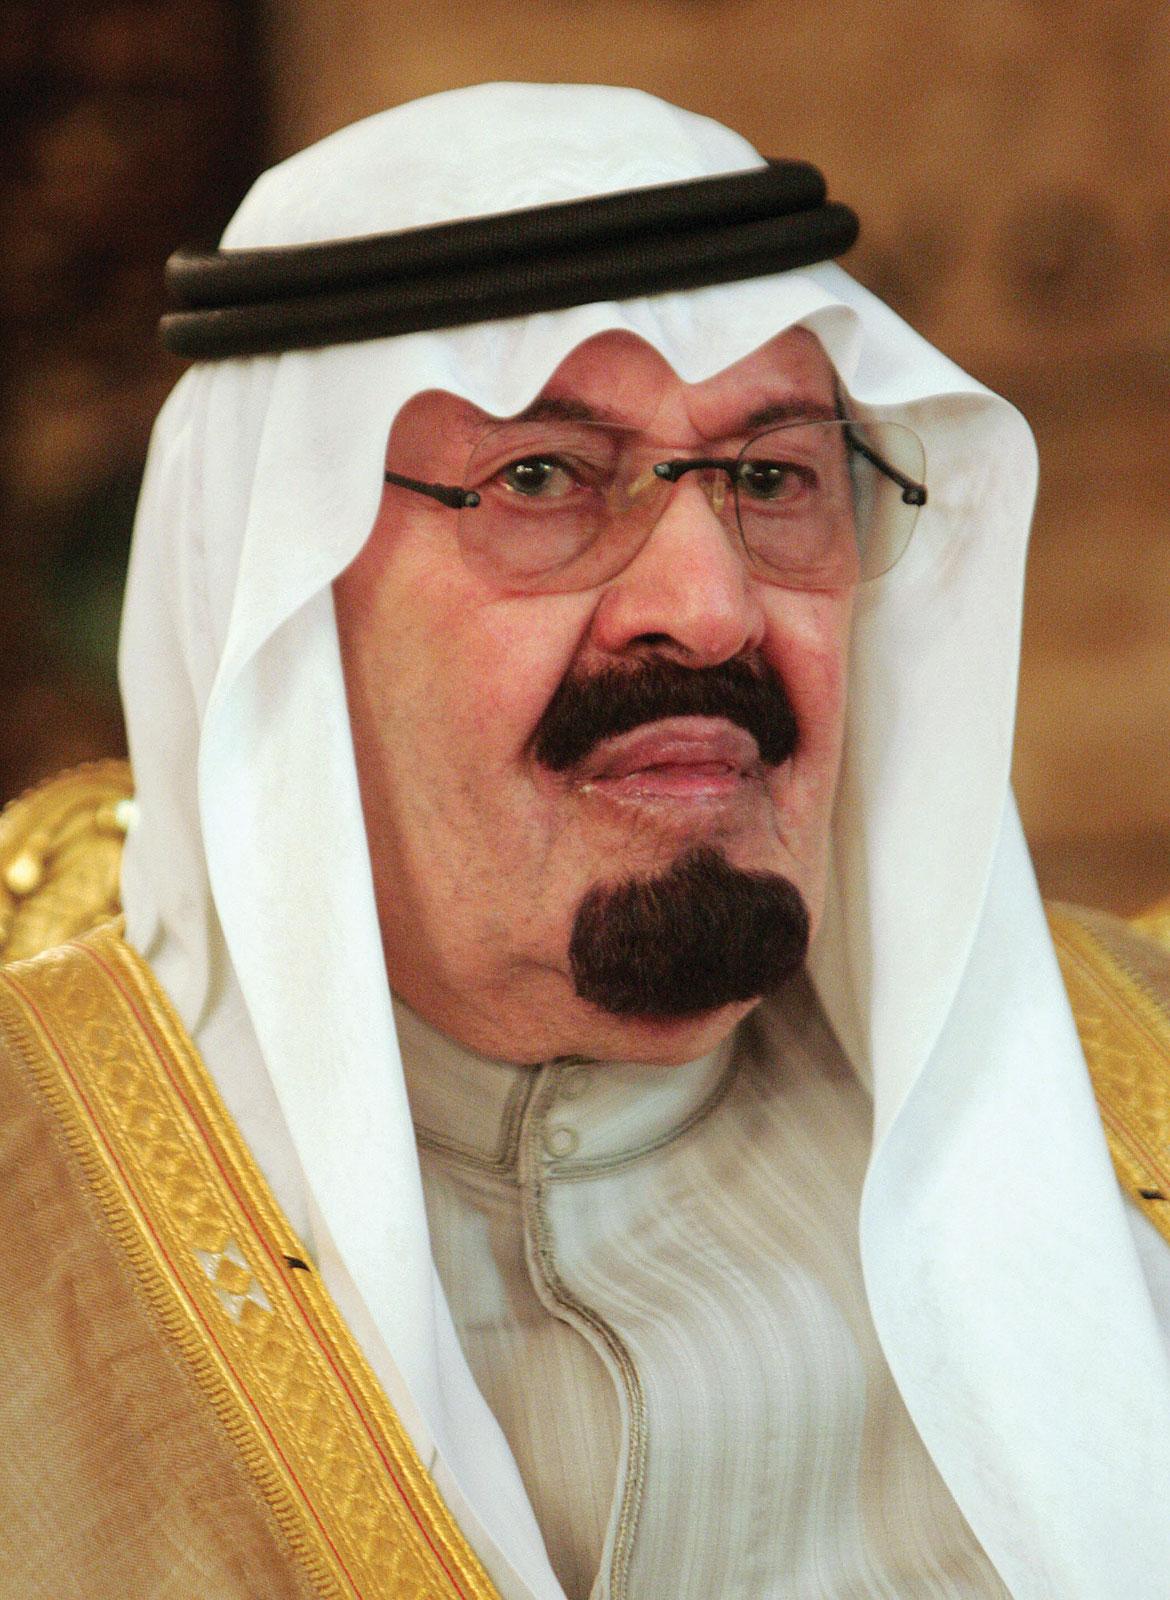 king of saudi arabia dead